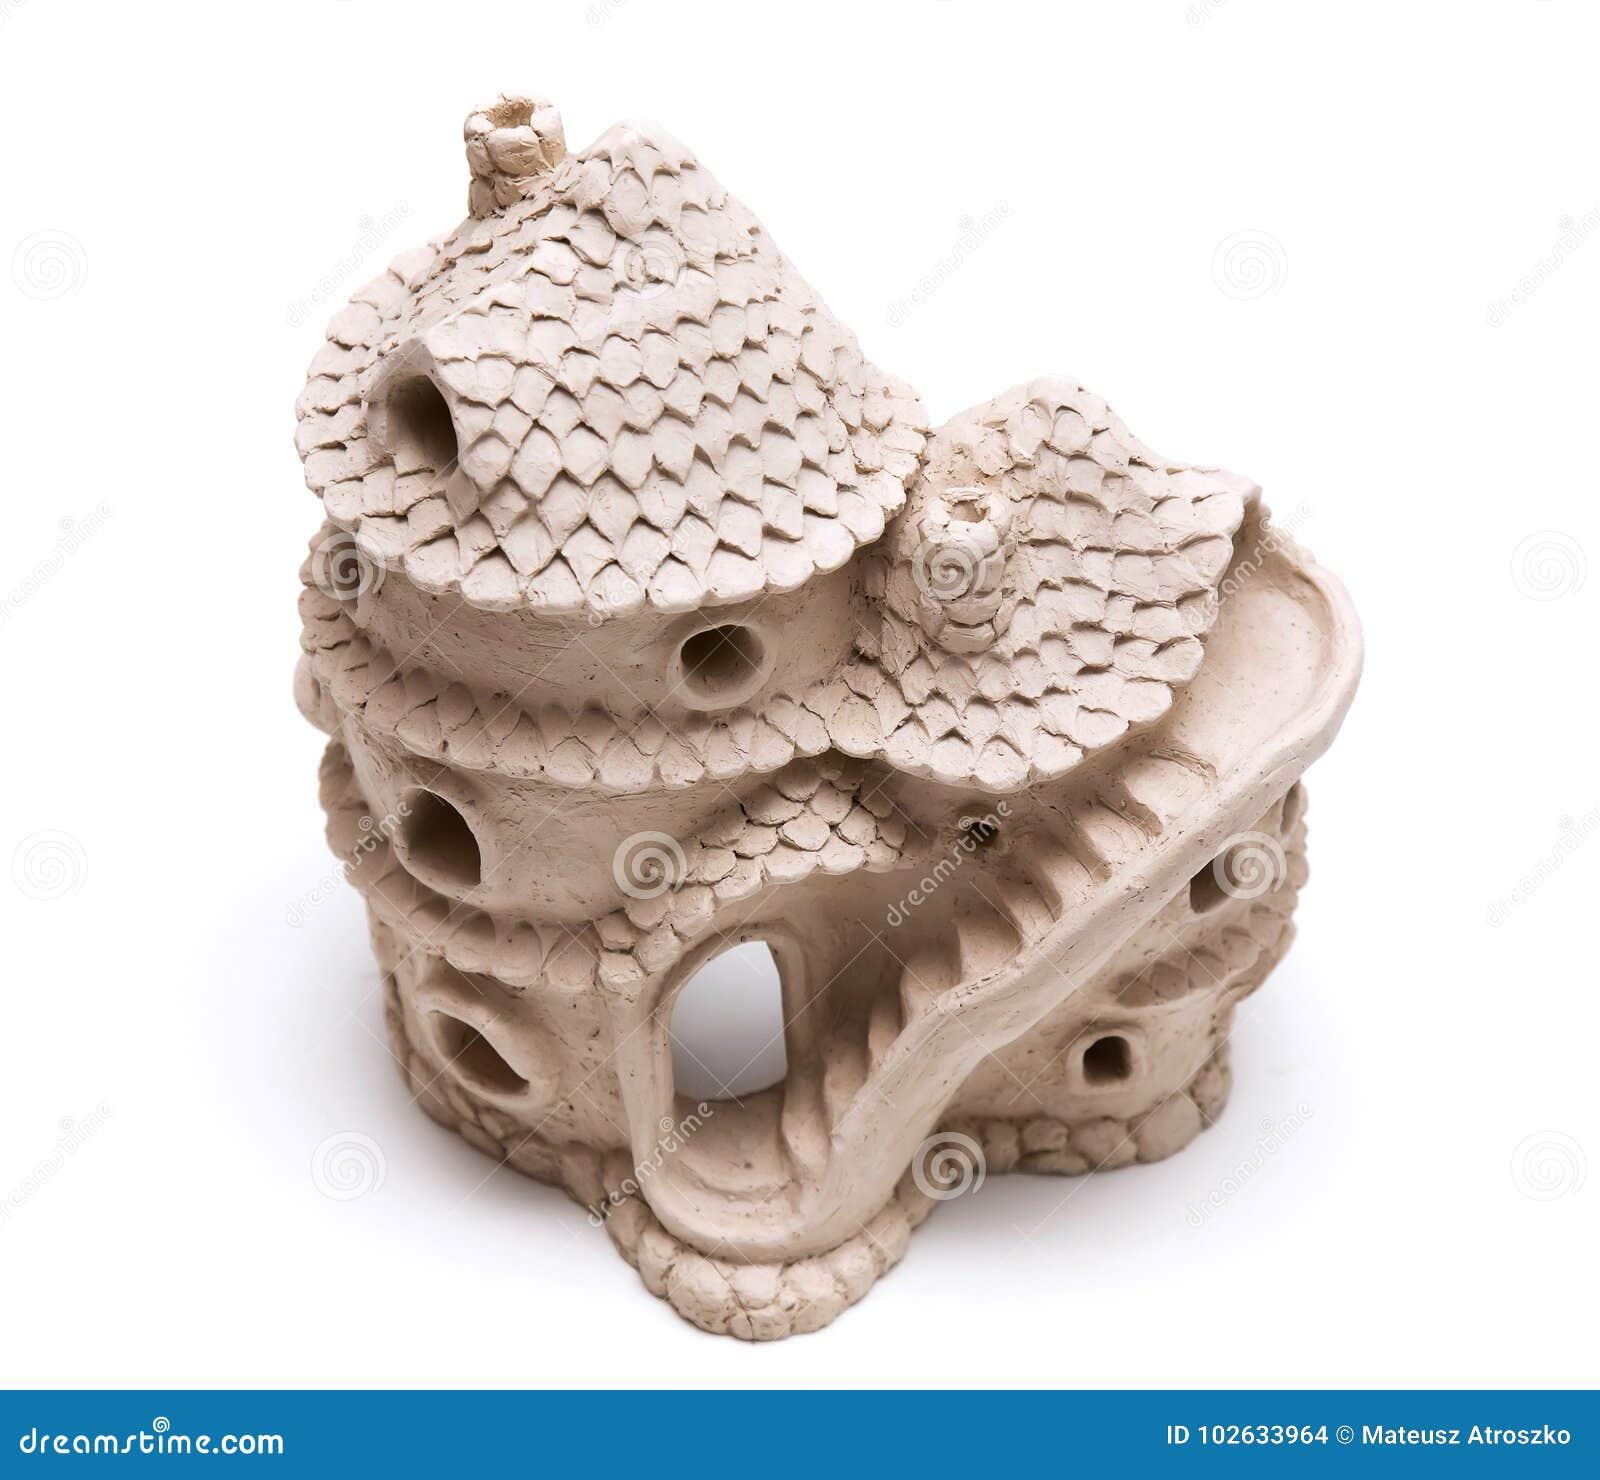 Ceramisch die poppenhuis van klei wordt gemaakt